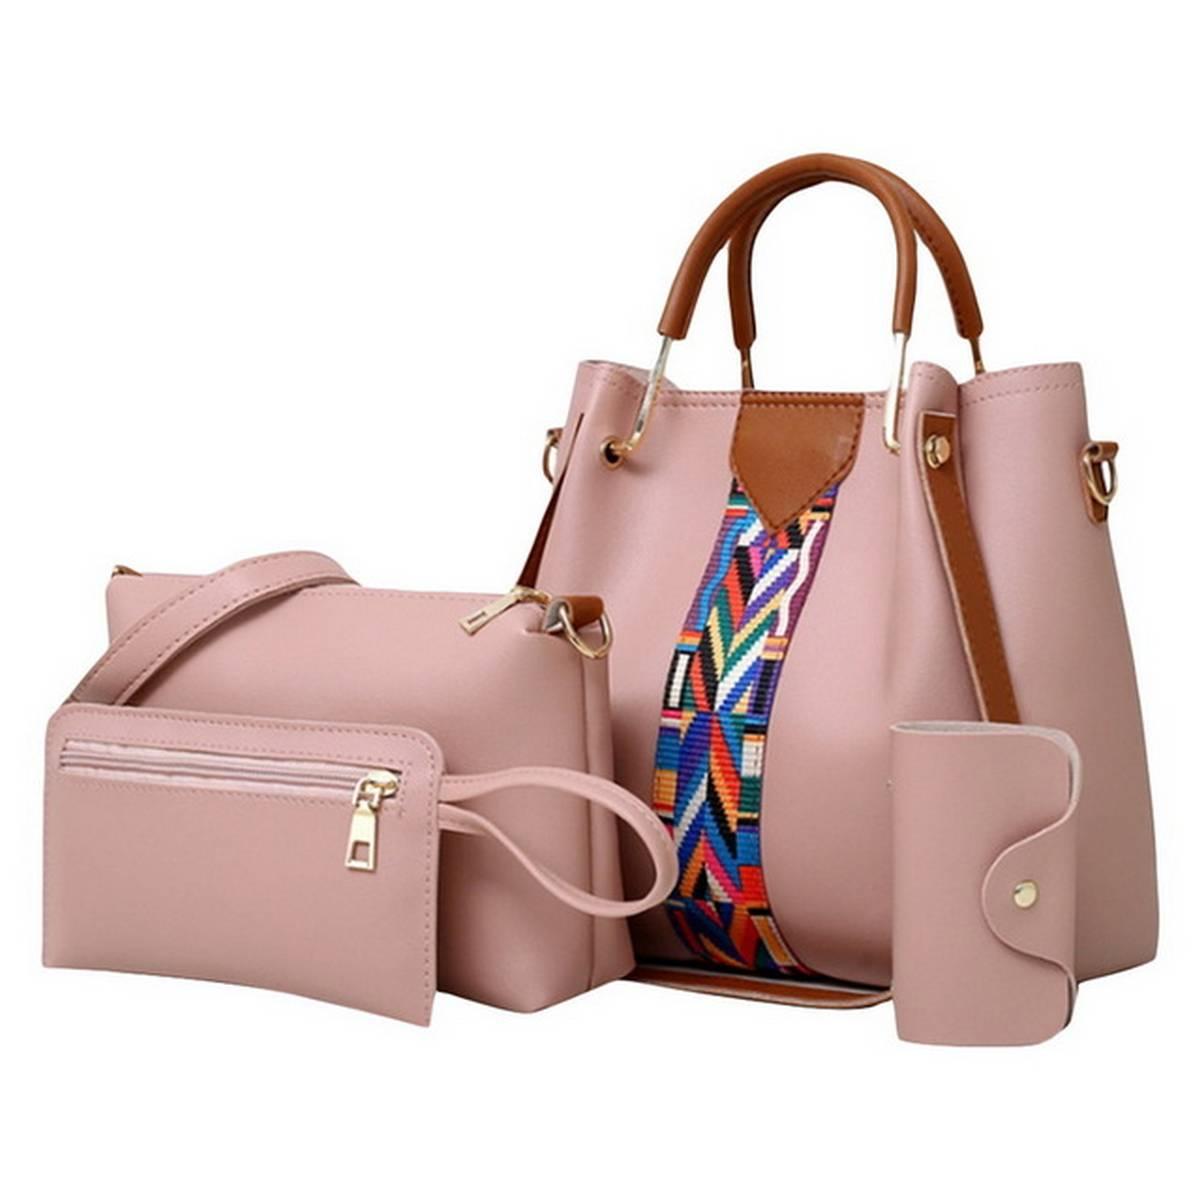 2021 Medium 4 Pcs Leather Hand Bag Set